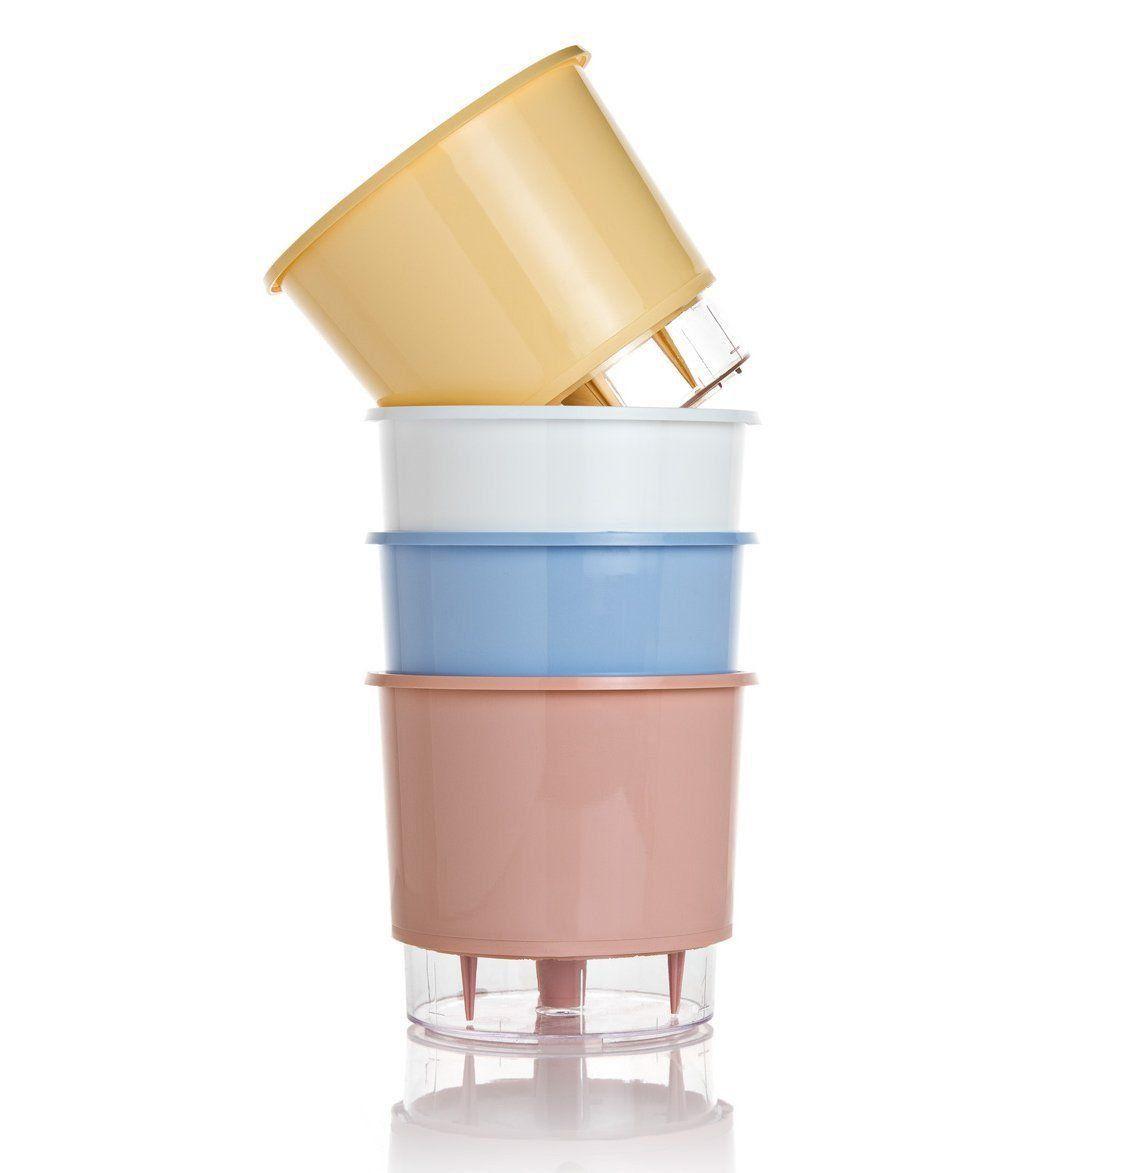 Kit 4 Vasos Autoirrigáveis PEQUENOS N02 Wishes